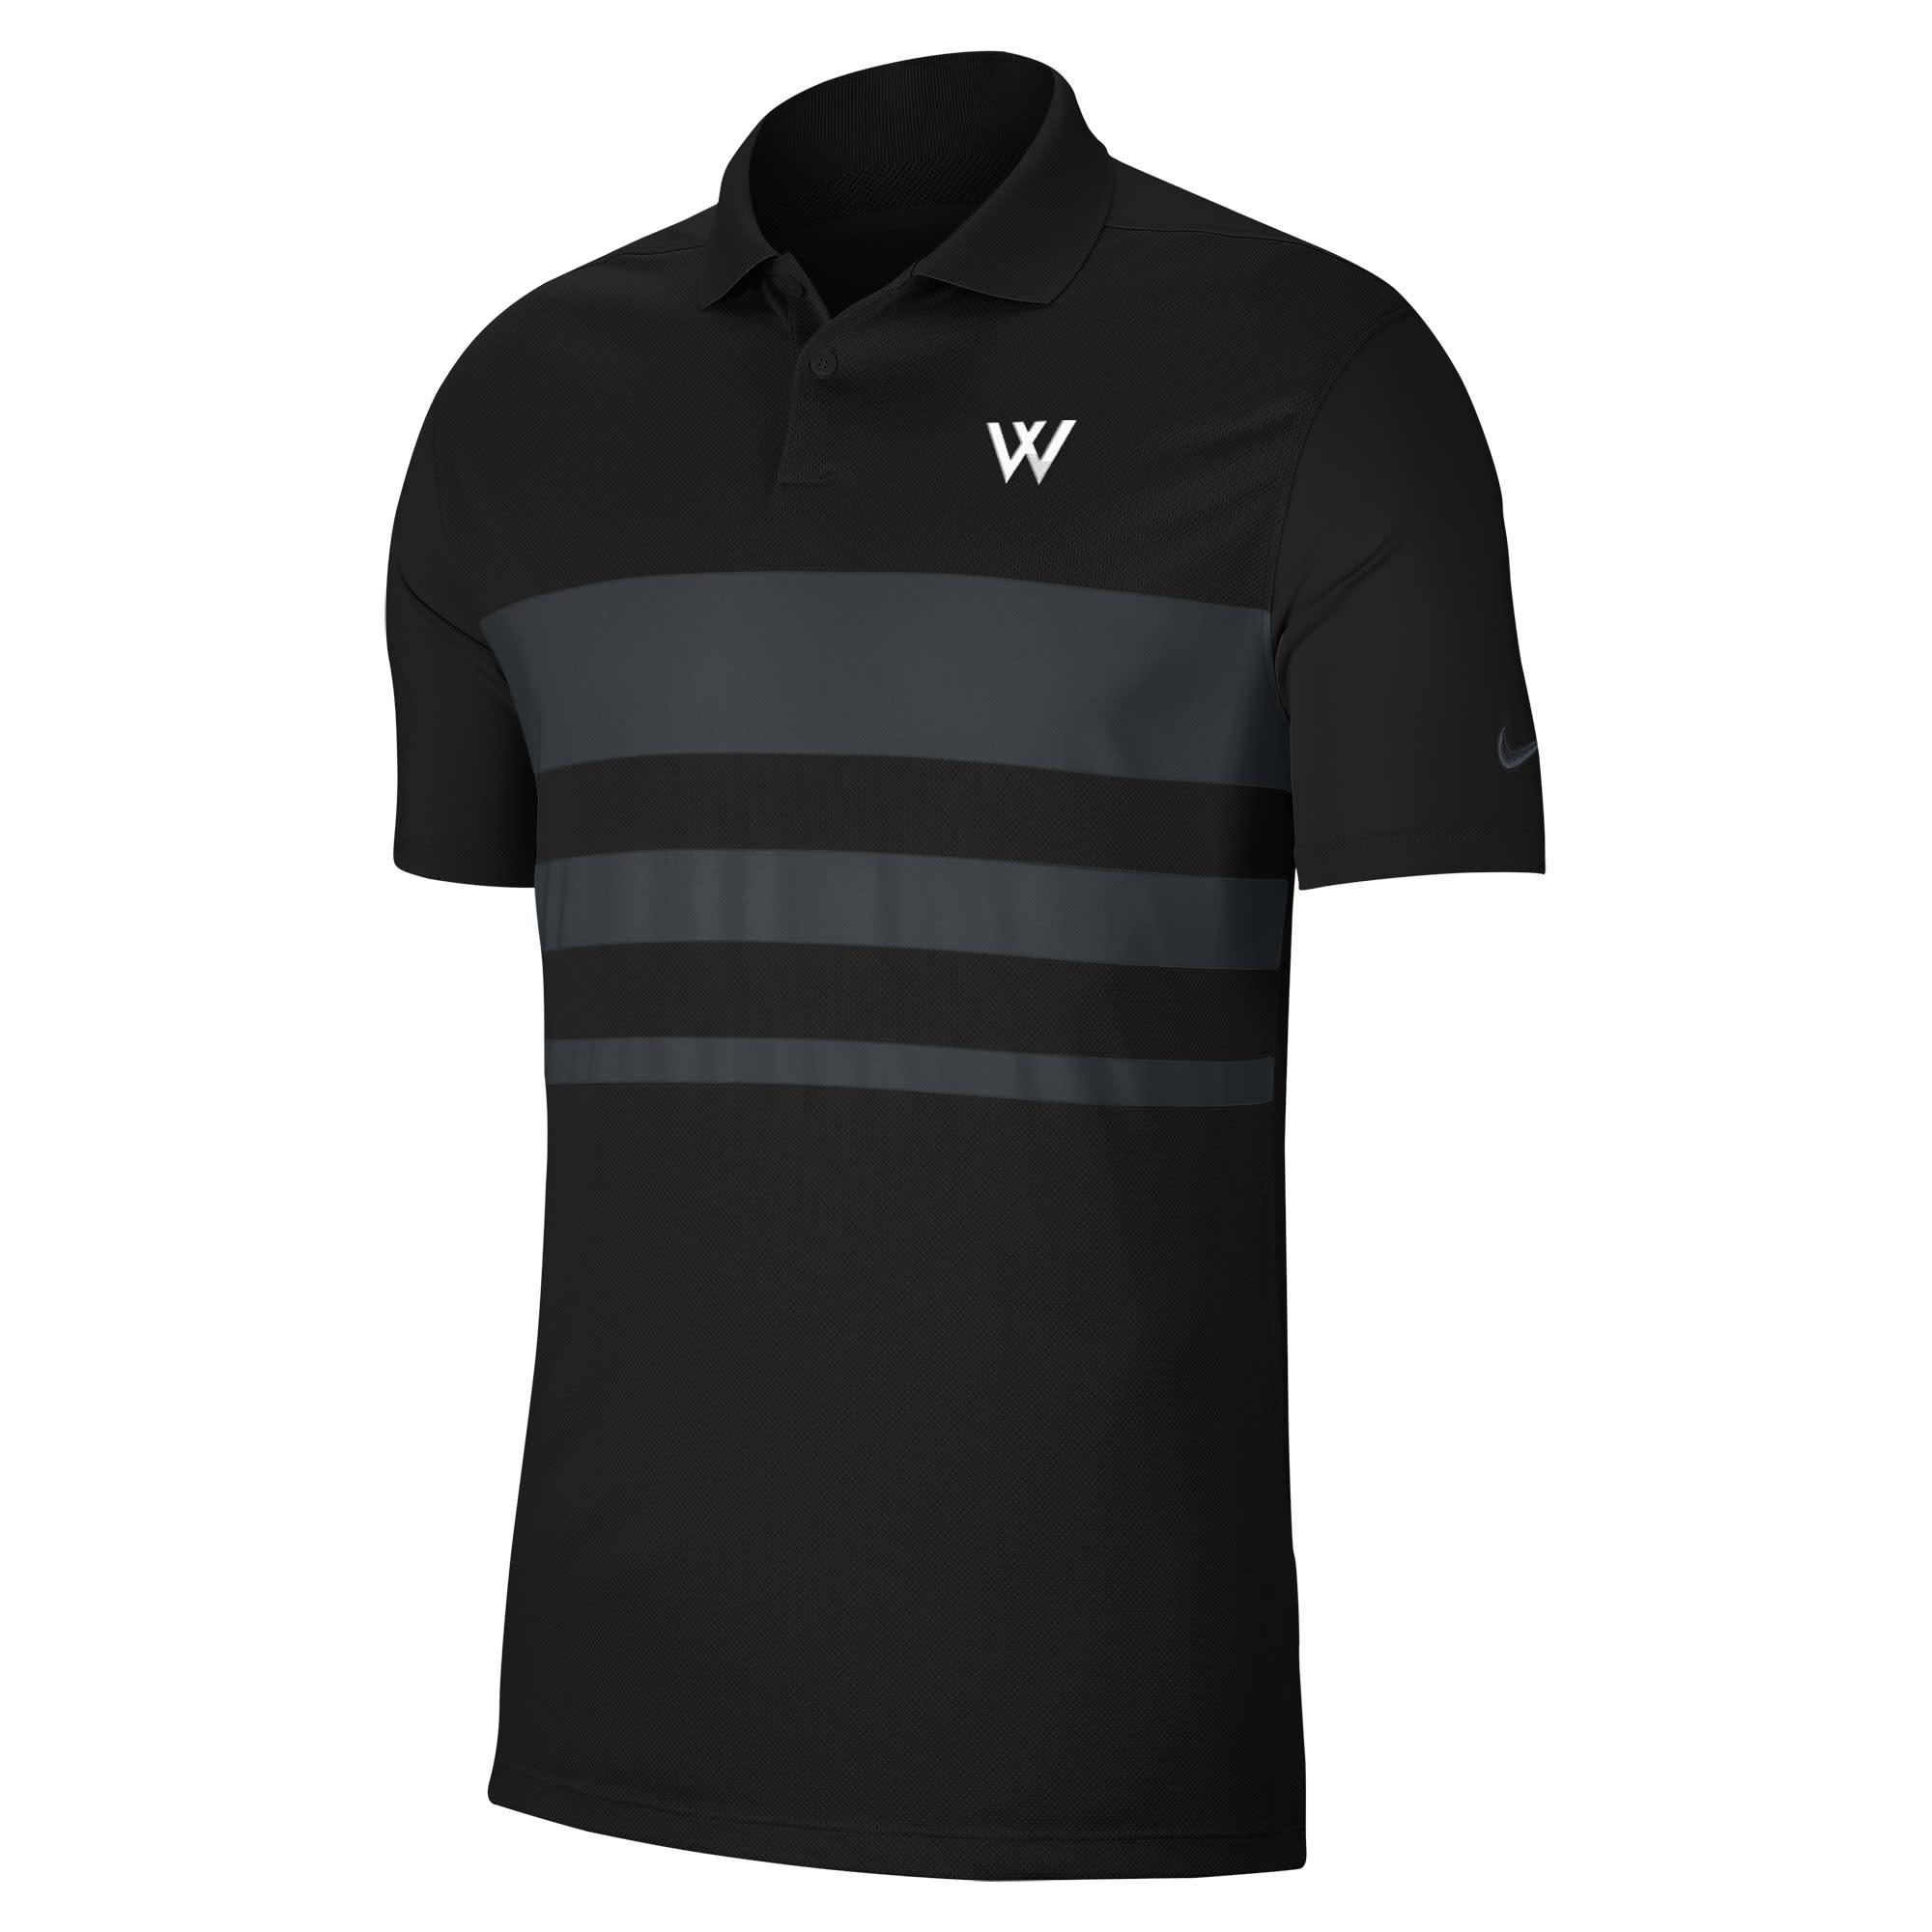 Nike Polo: Nike Vapor Victory Block - Black/Graphite